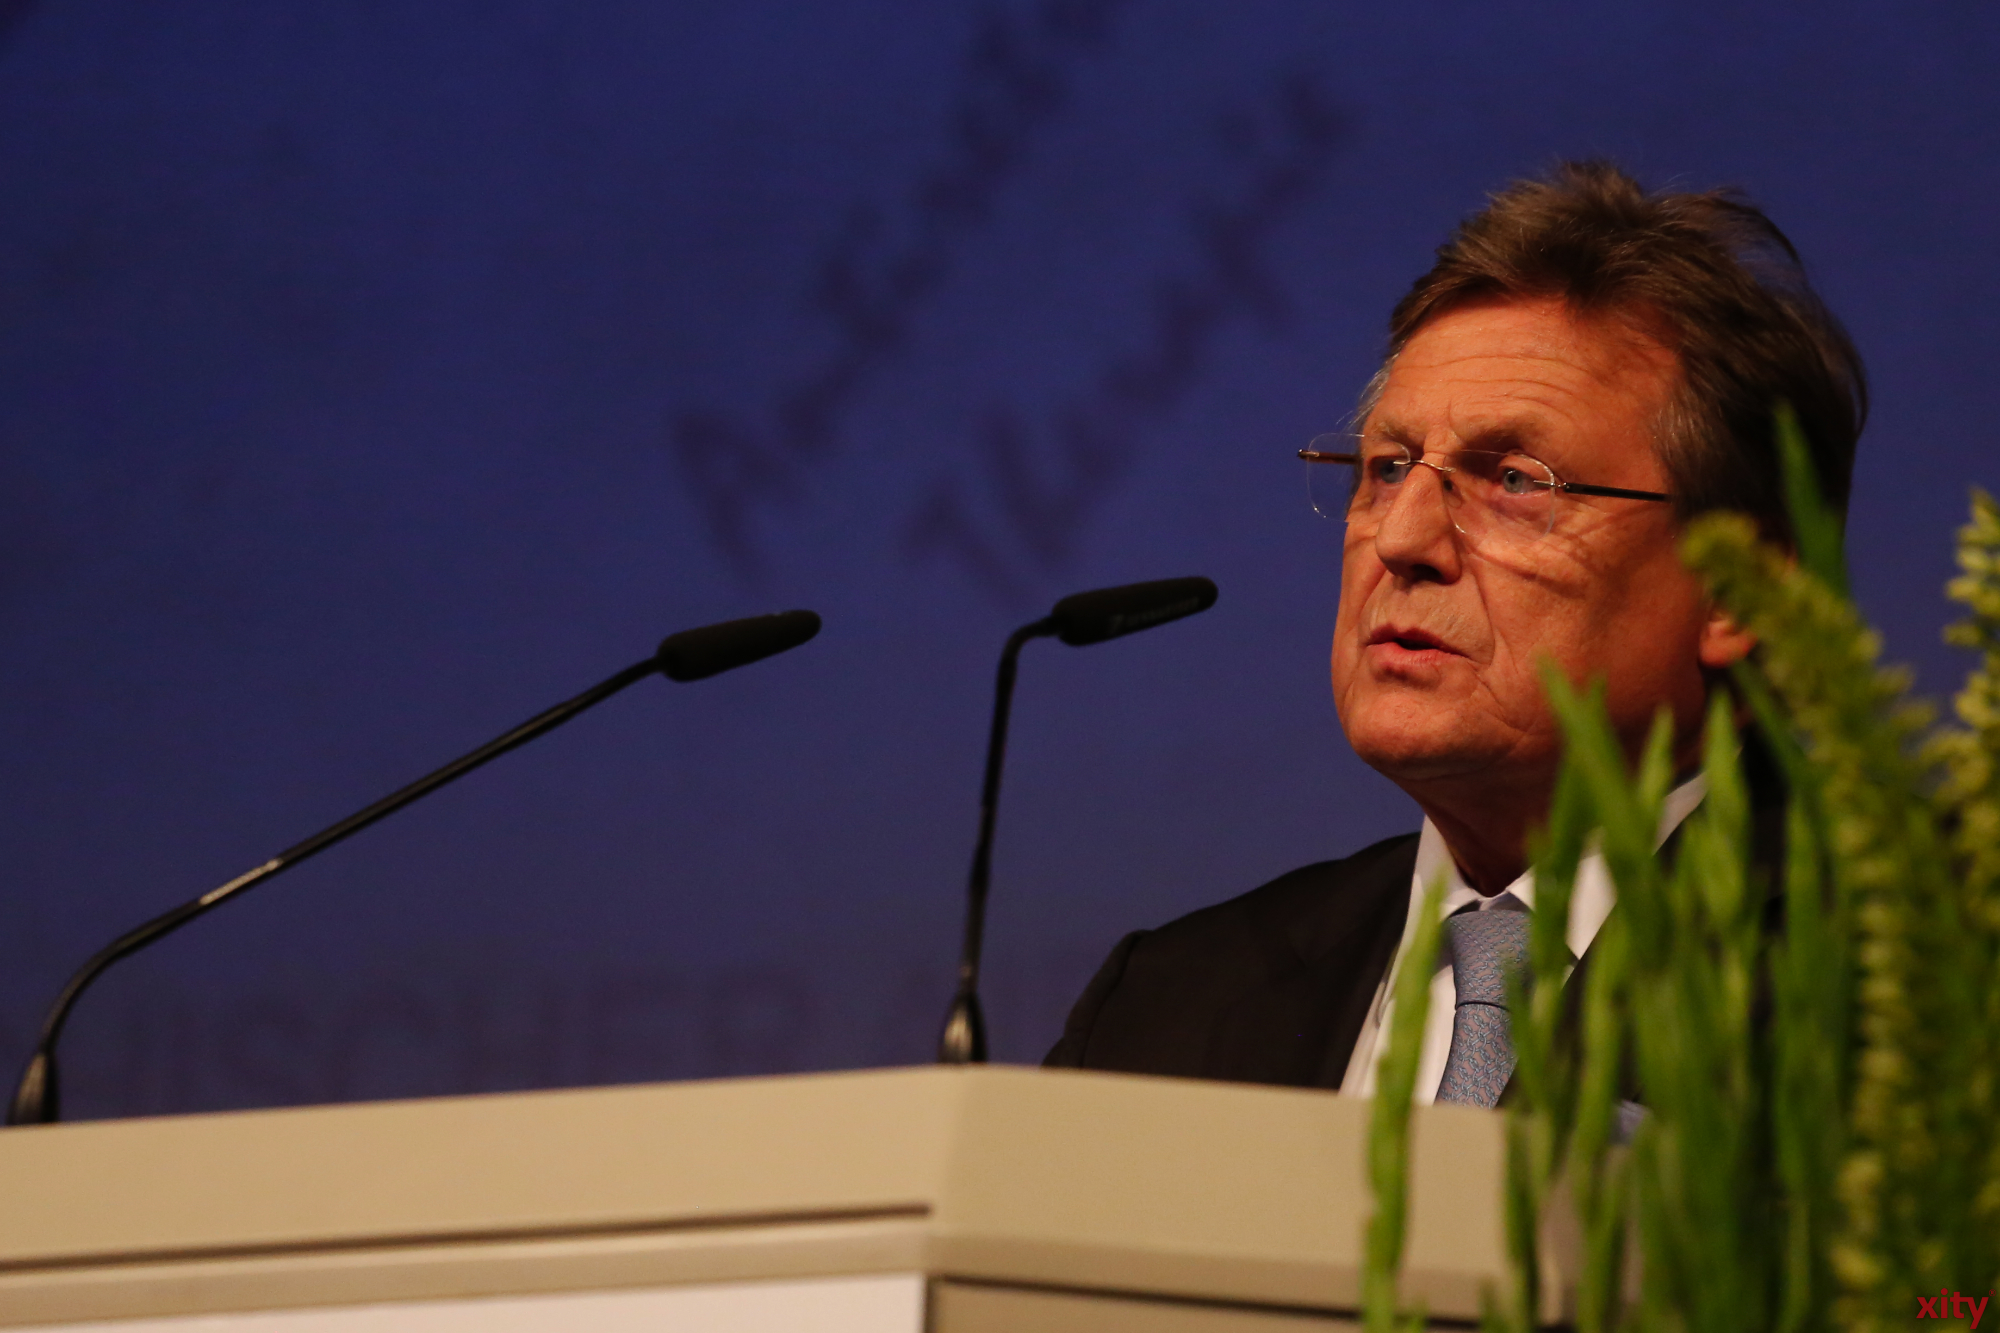 Prof. Dr. Dieter Hässing hielt die Eröffnungsrede (Foto: xity)